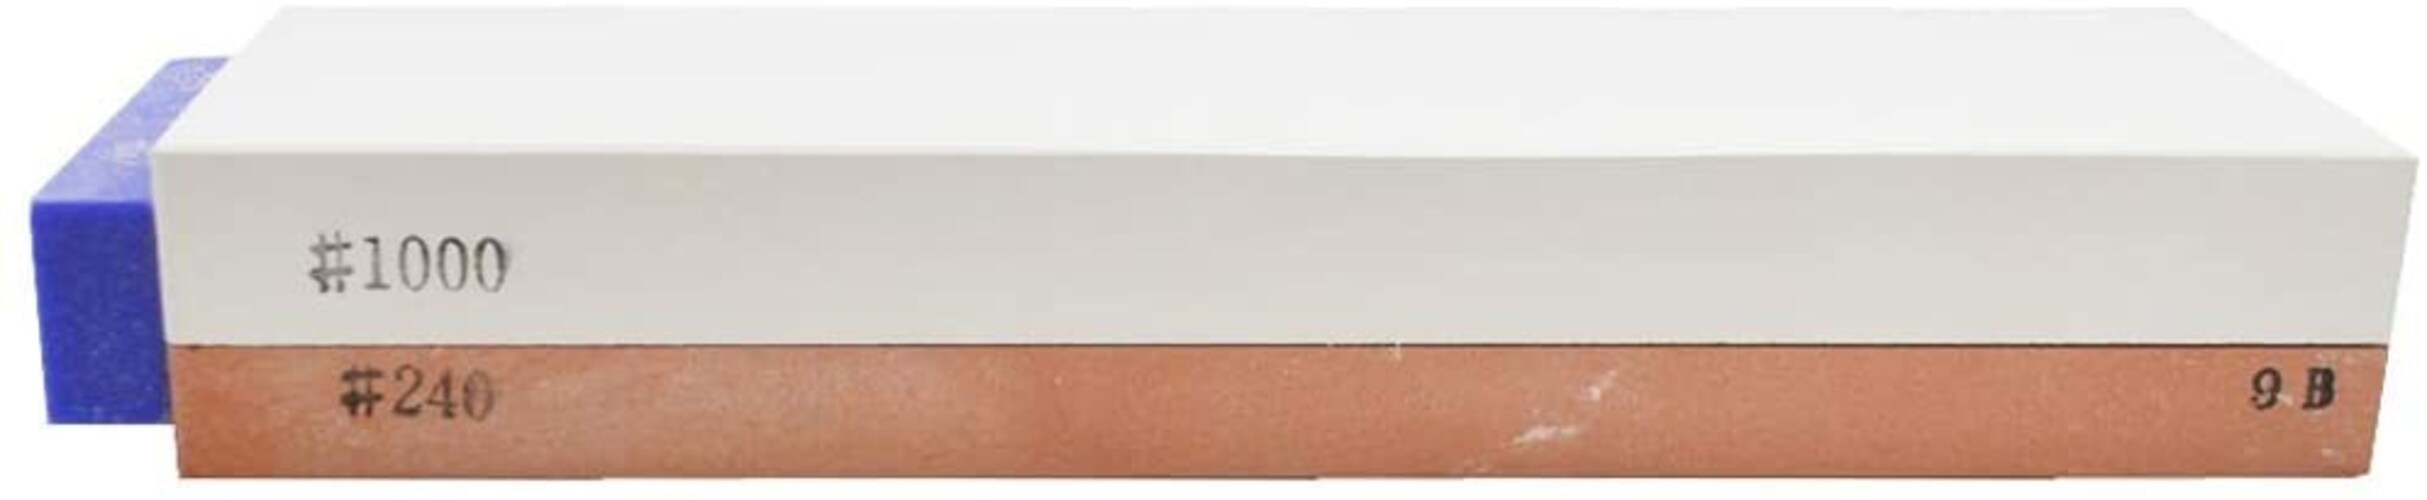 裏表一体型の砥石